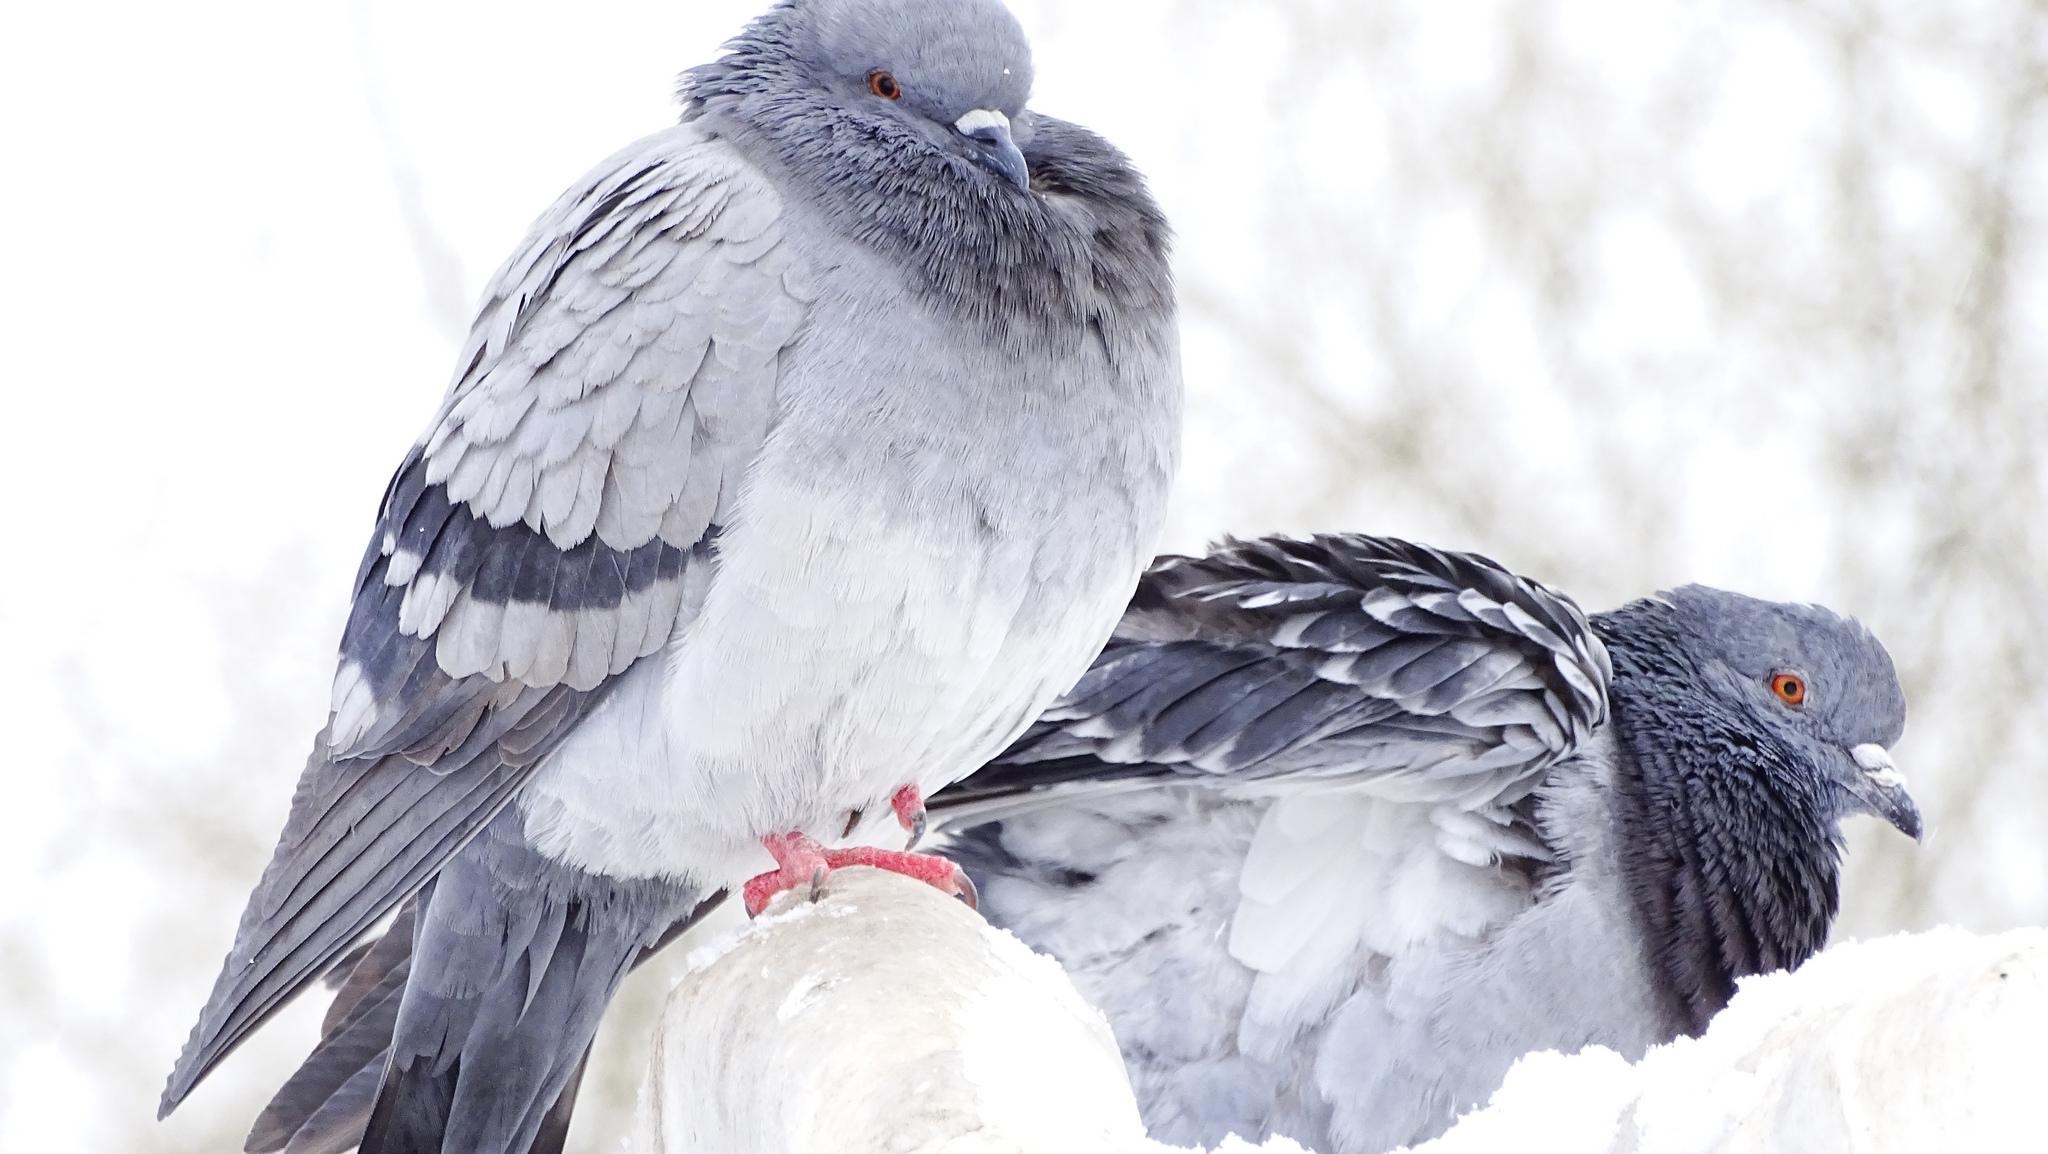 files/images/2017-12-15-pigeon.jpg